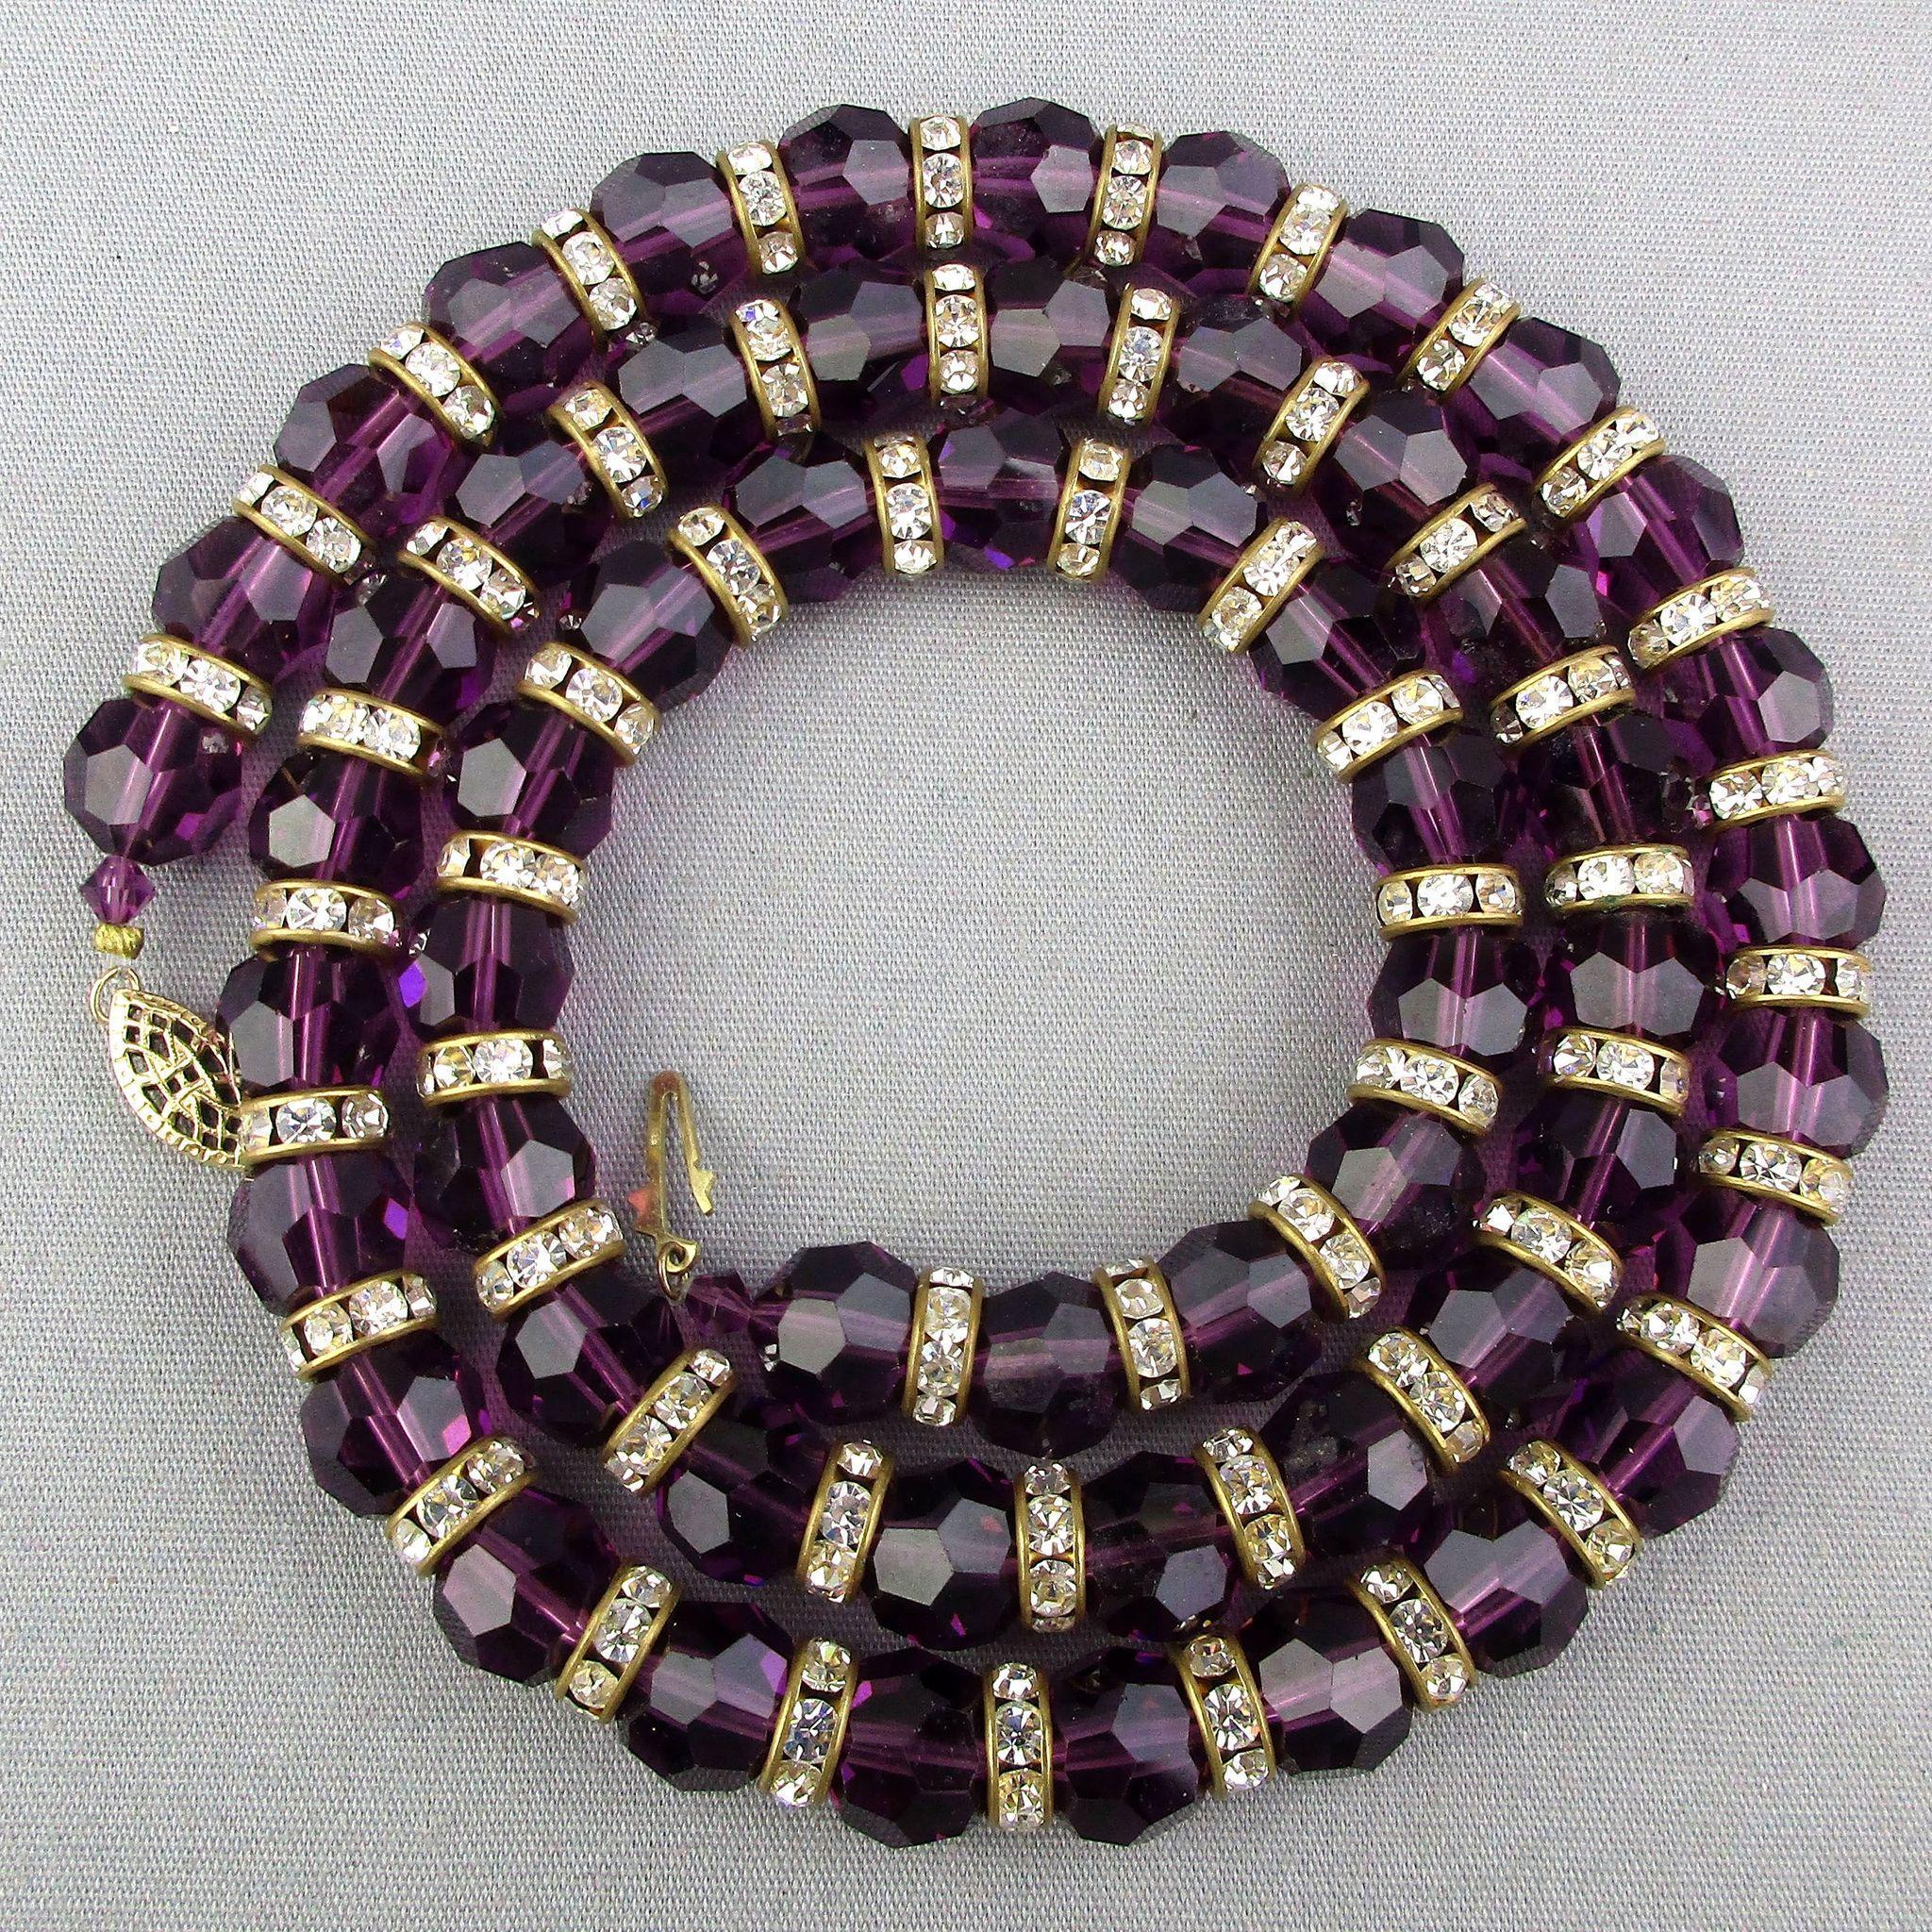 Grand Amethyst Rhinestone Bead Necklace 99 Grams